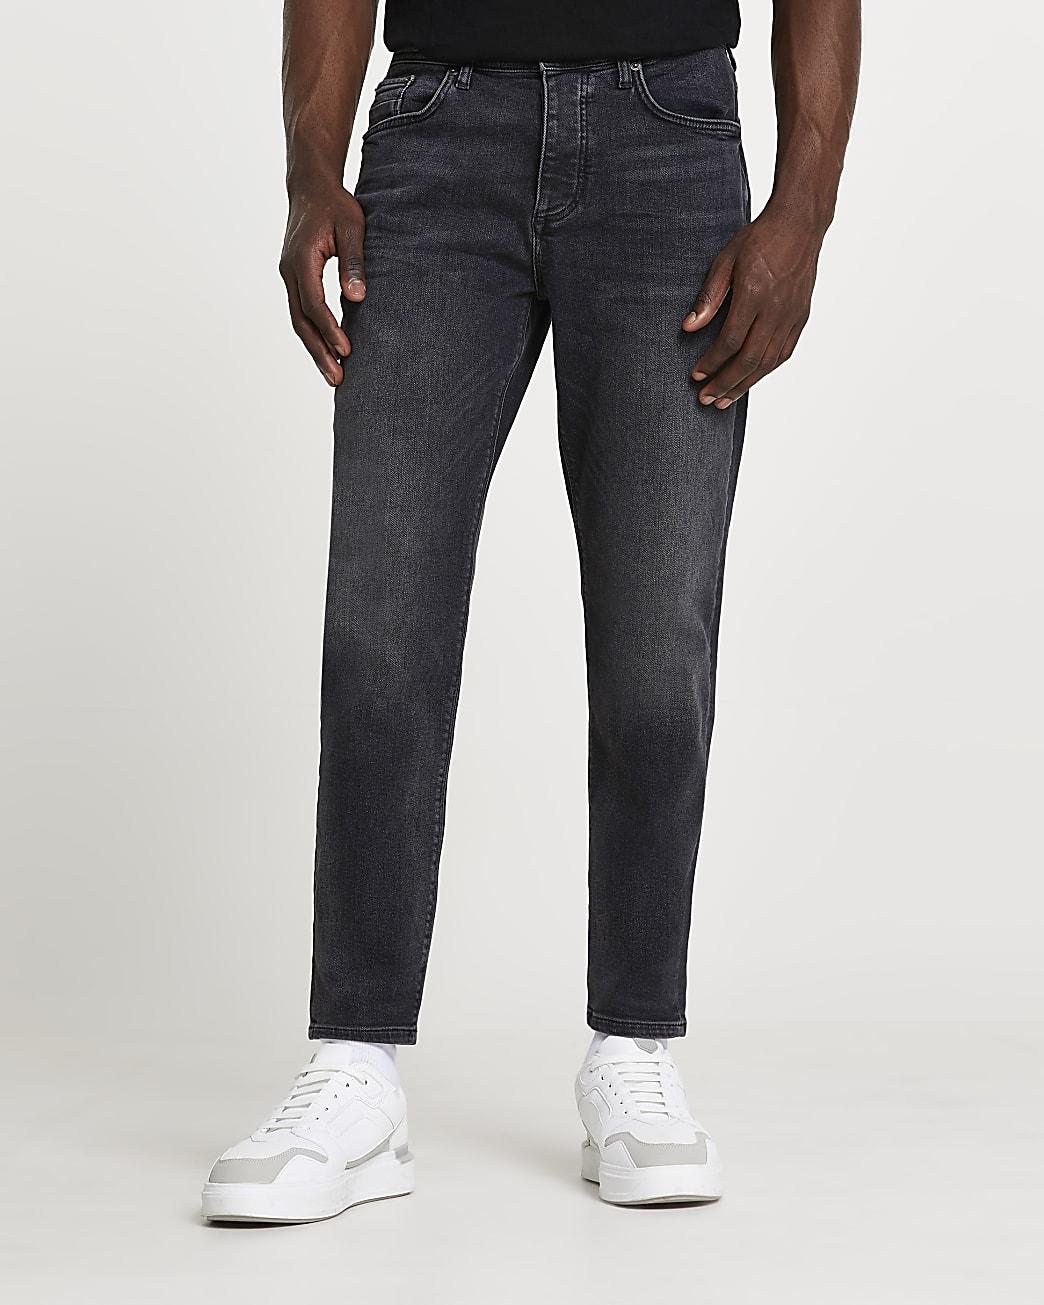 Black tapered denim jeans